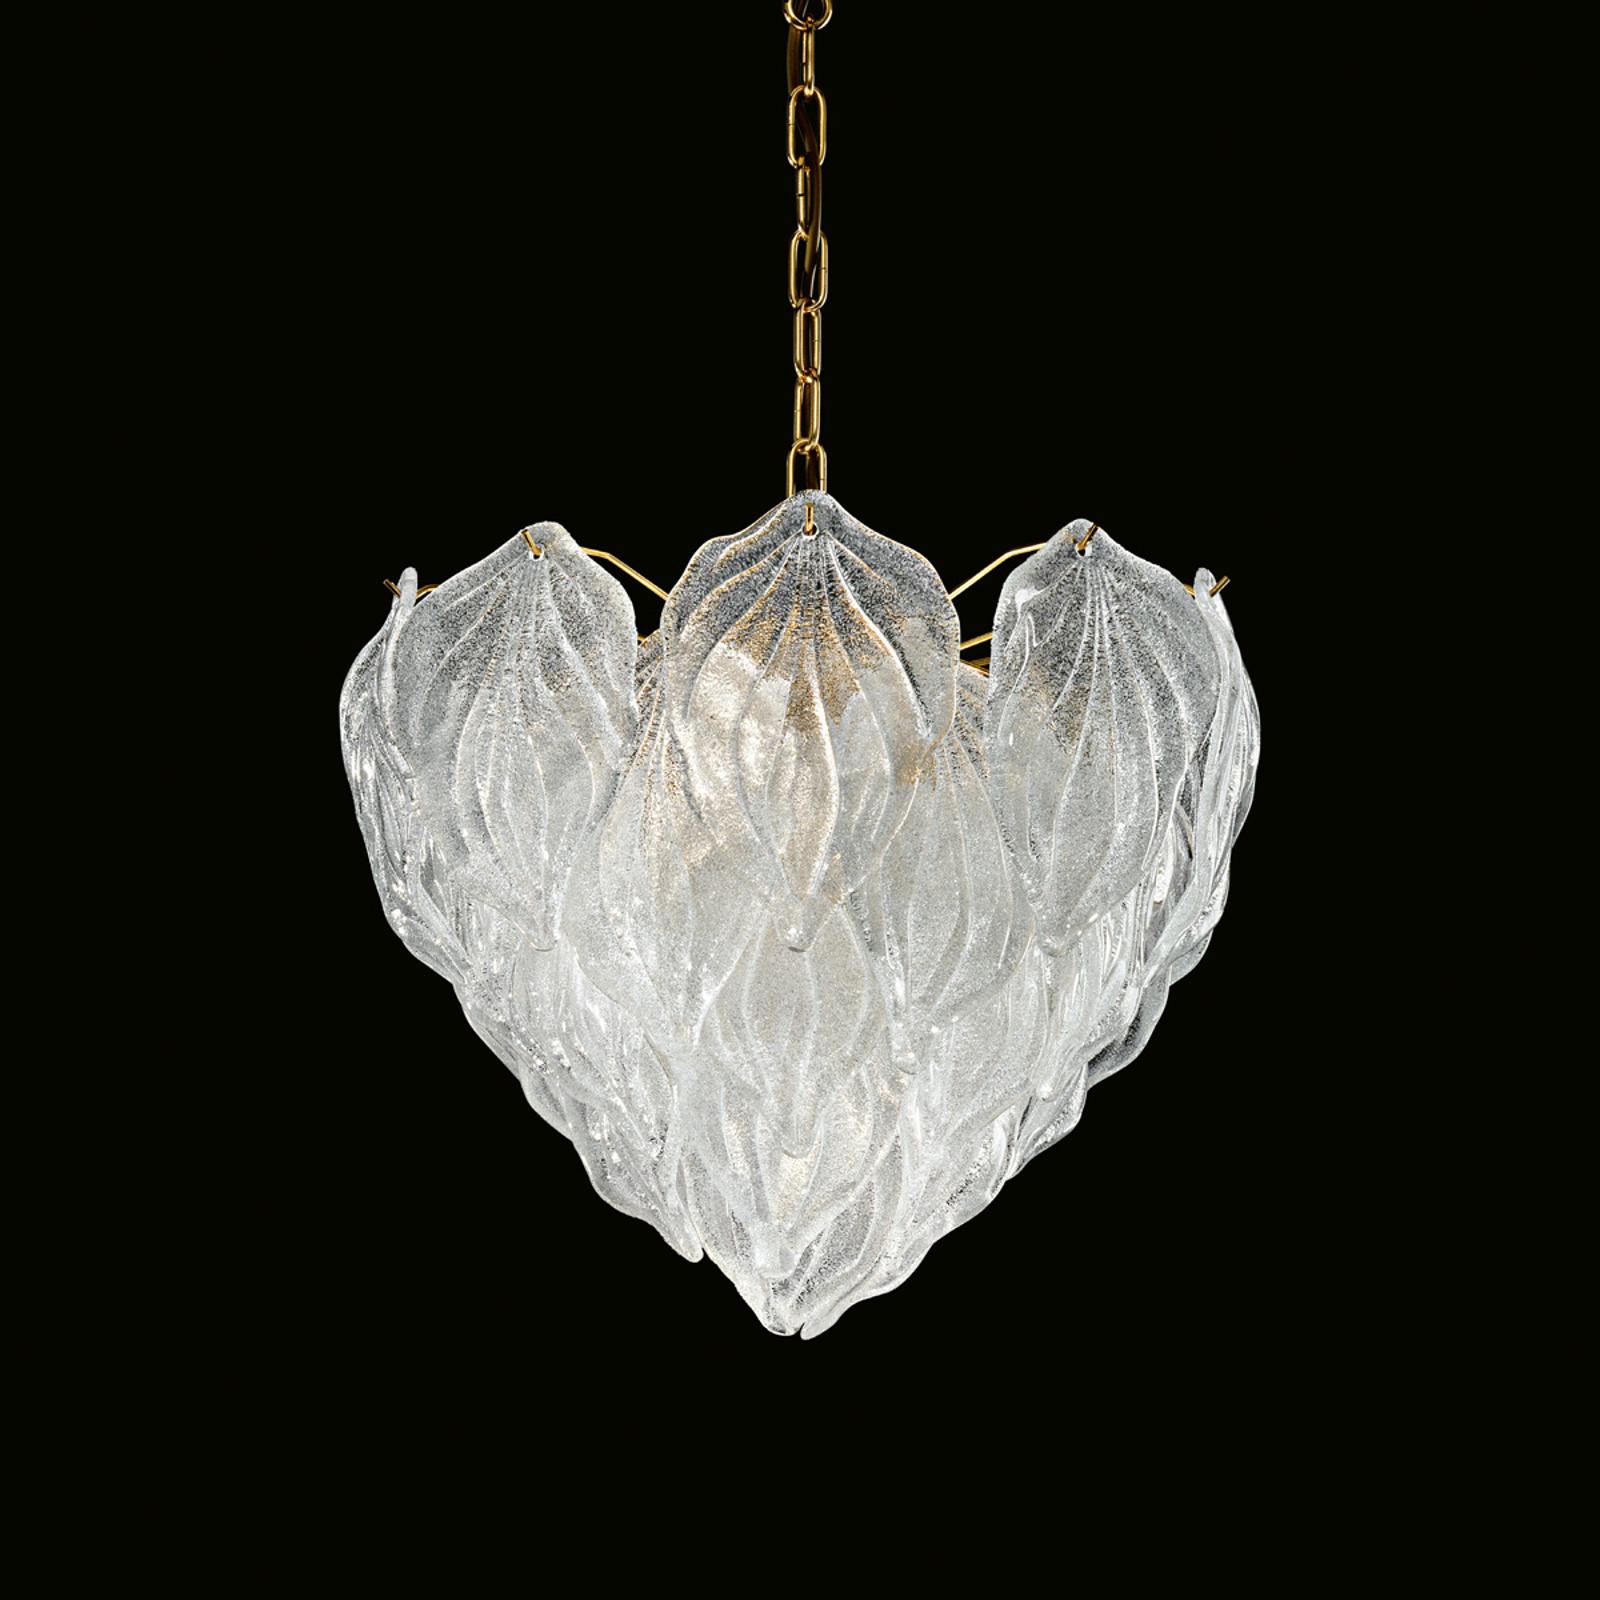 Multi-layered glass hanging light Foglie, 45 cm_7014060_1